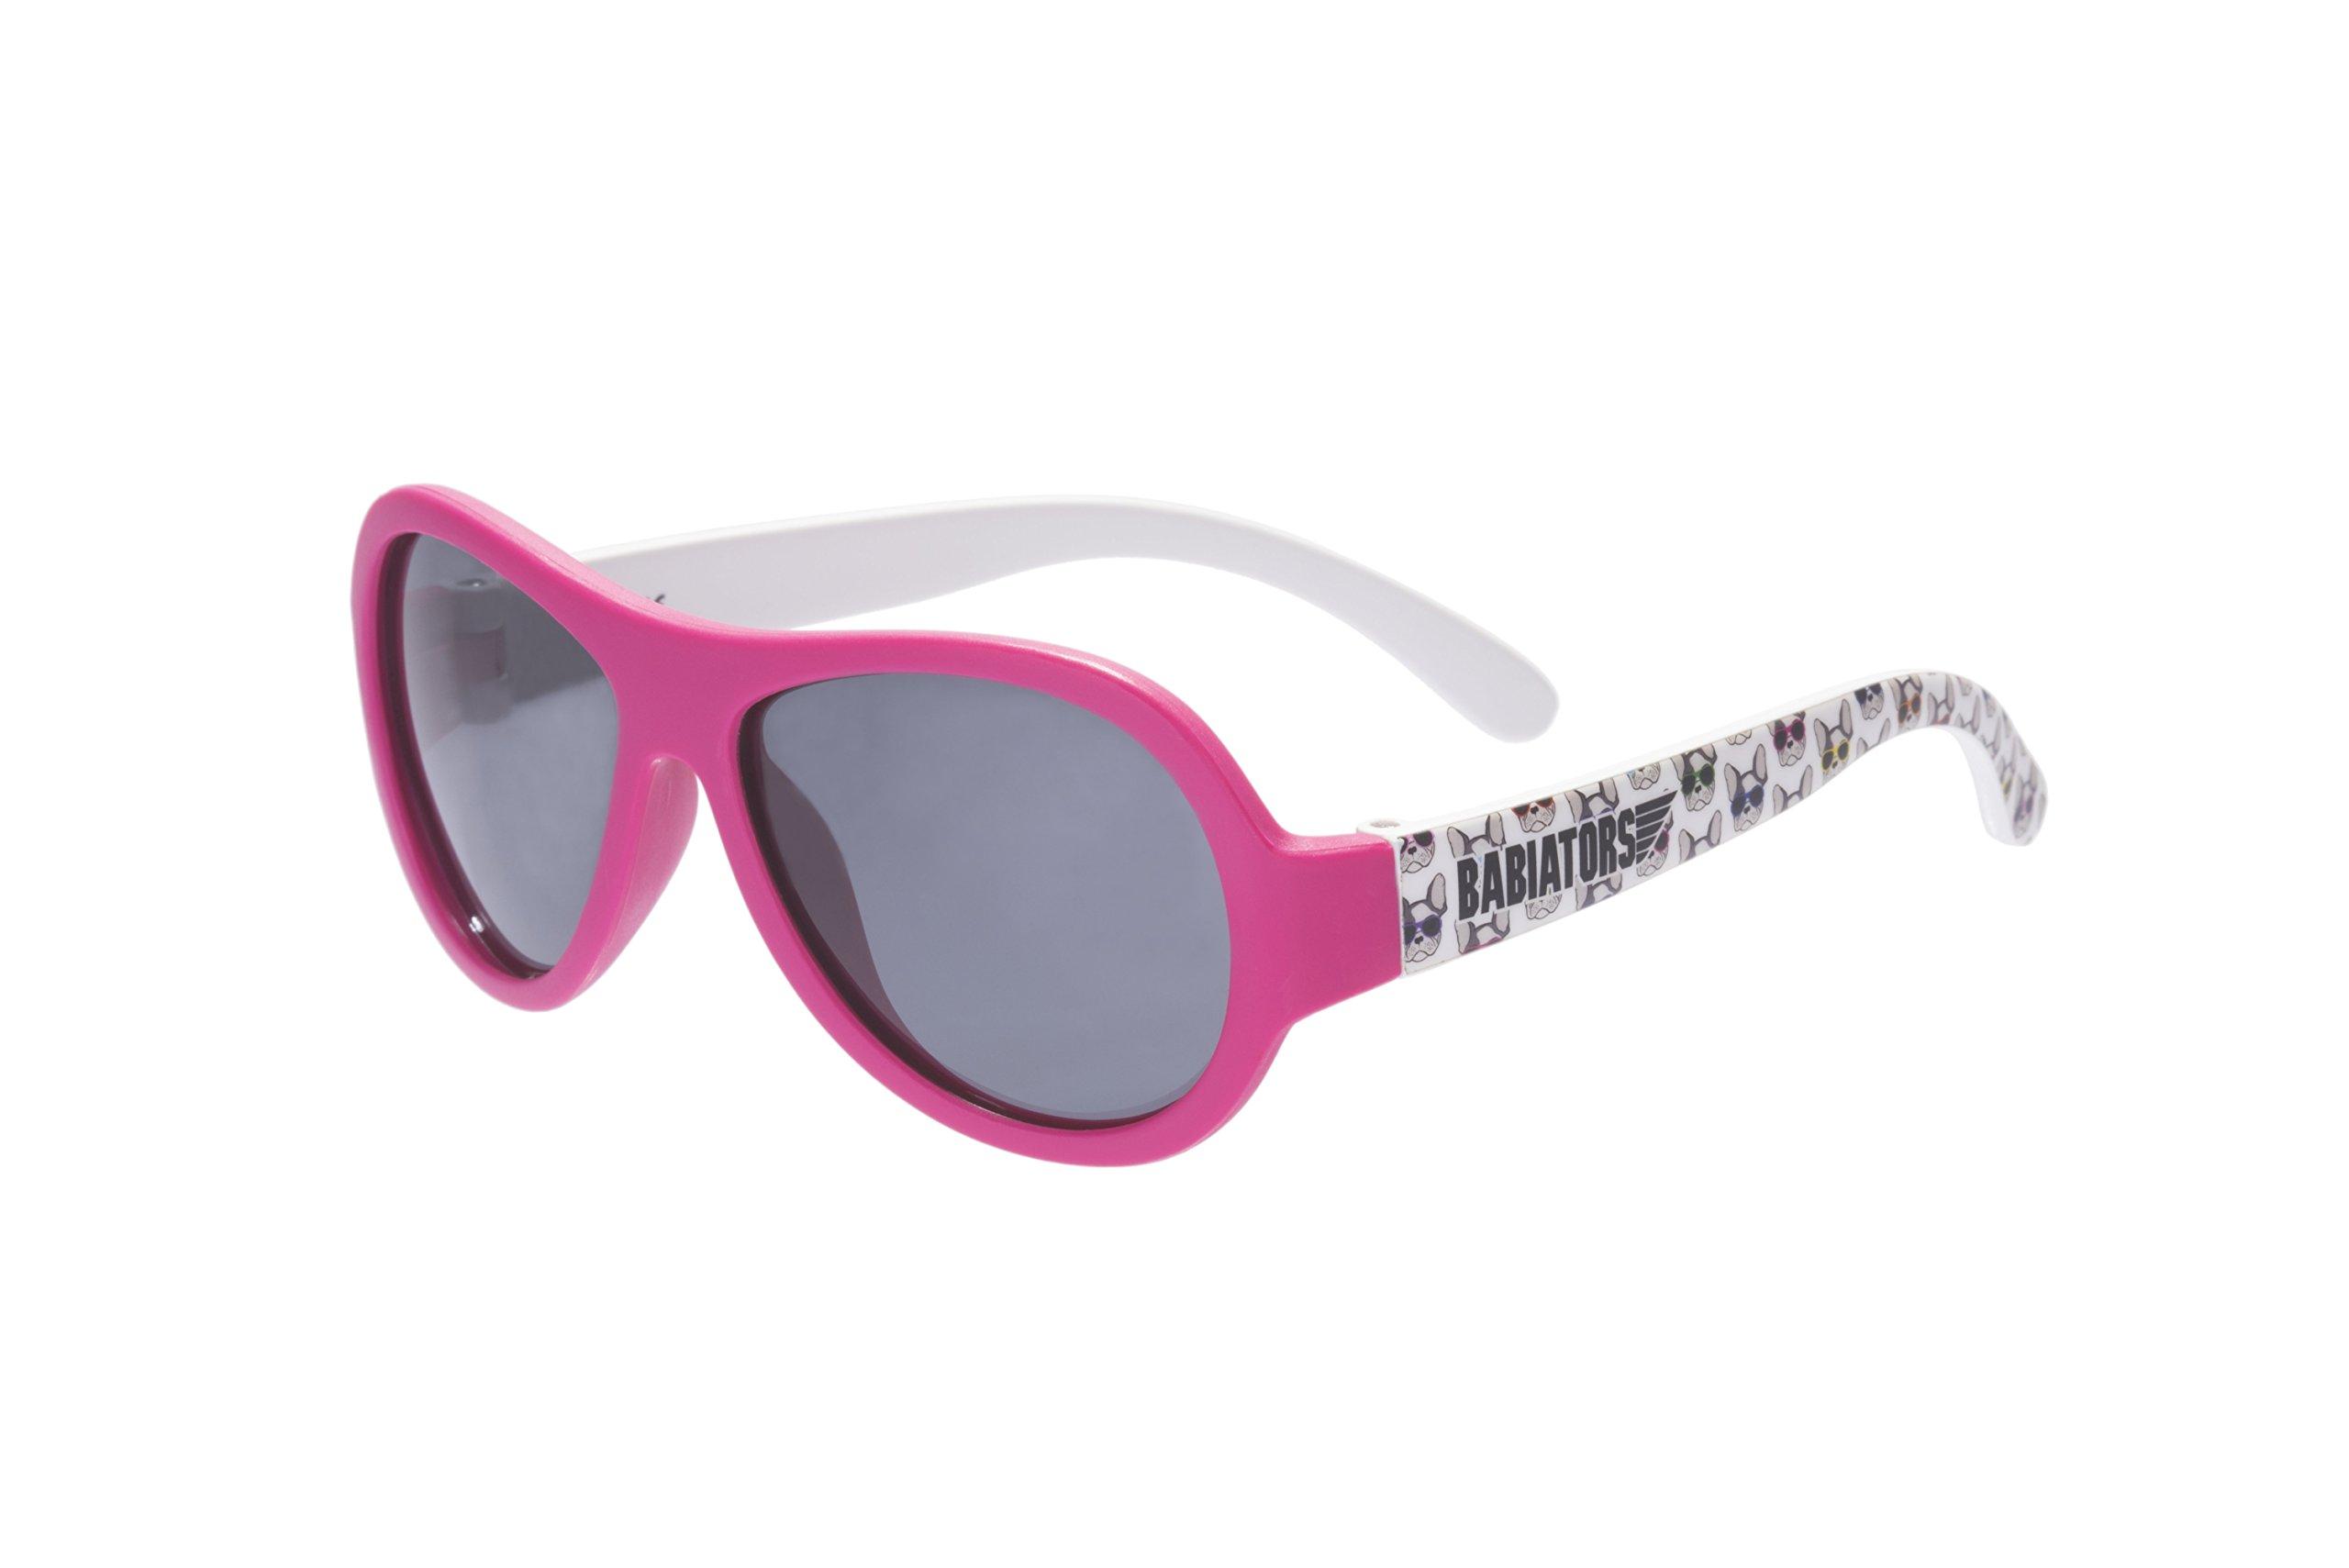 Babiators Polarized Aviator Sunglasses, Puppy Love (3-5 Years)